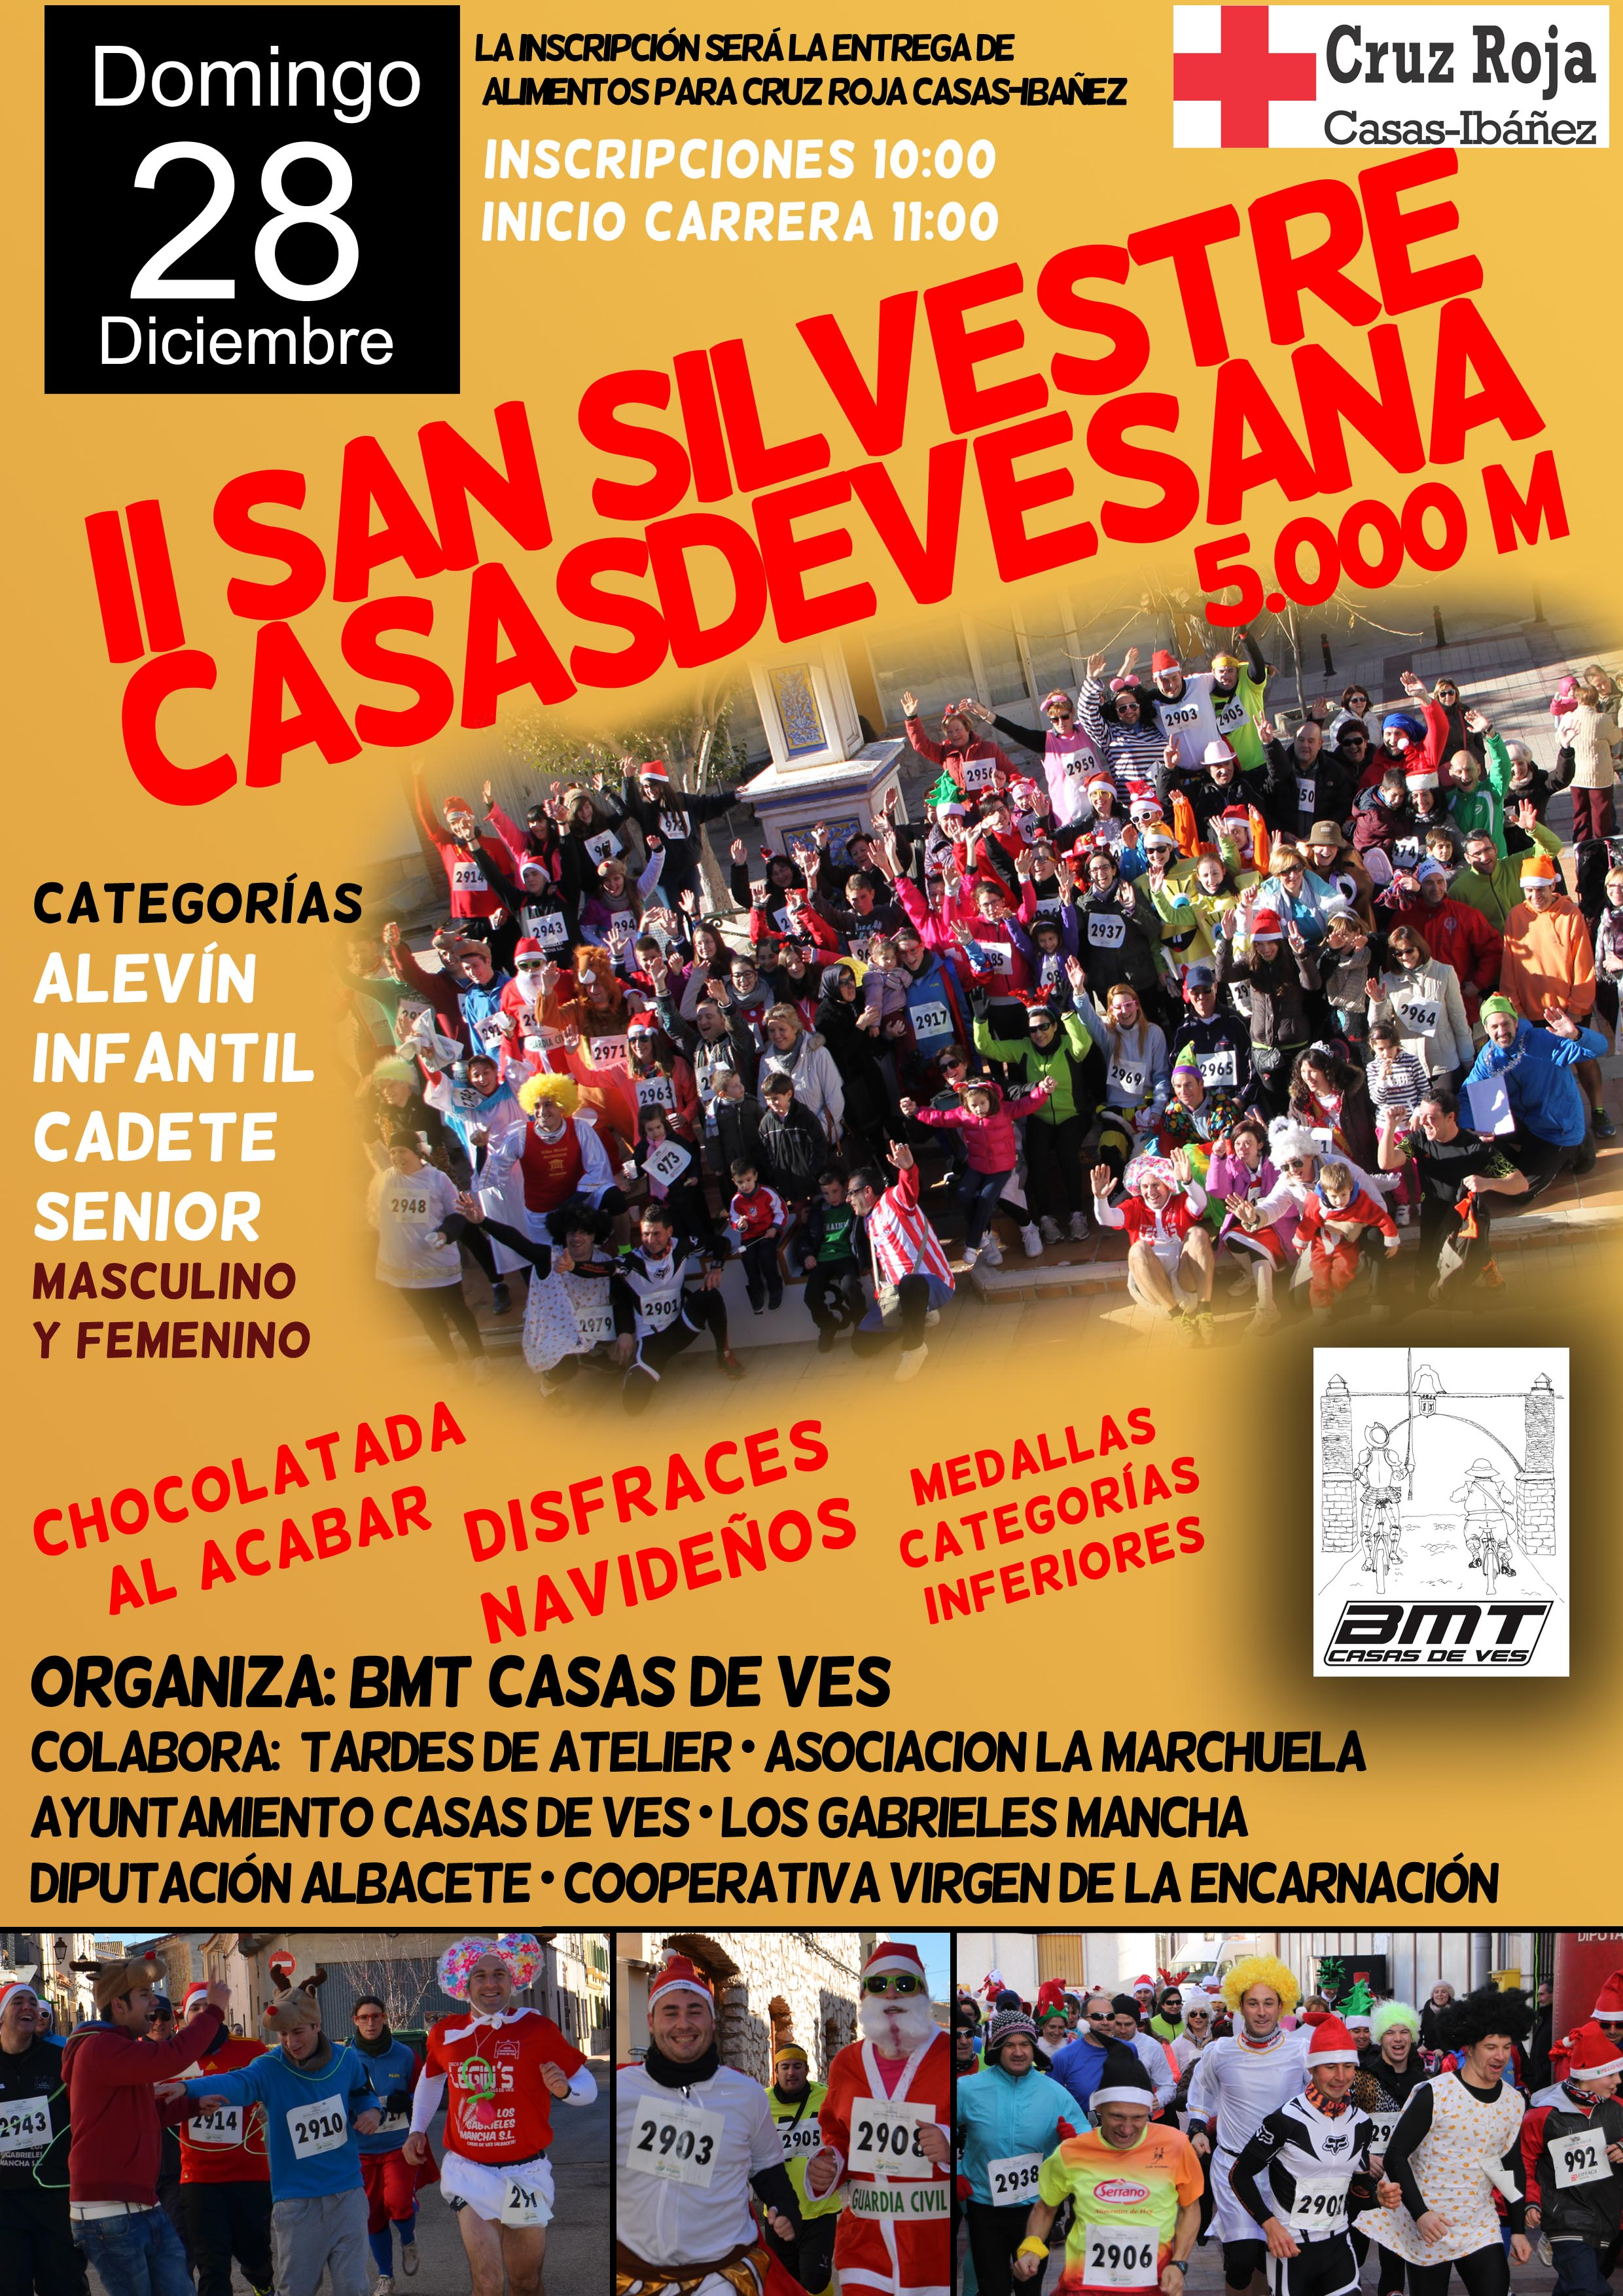 Cartel II San Silvestre Casasdevesana